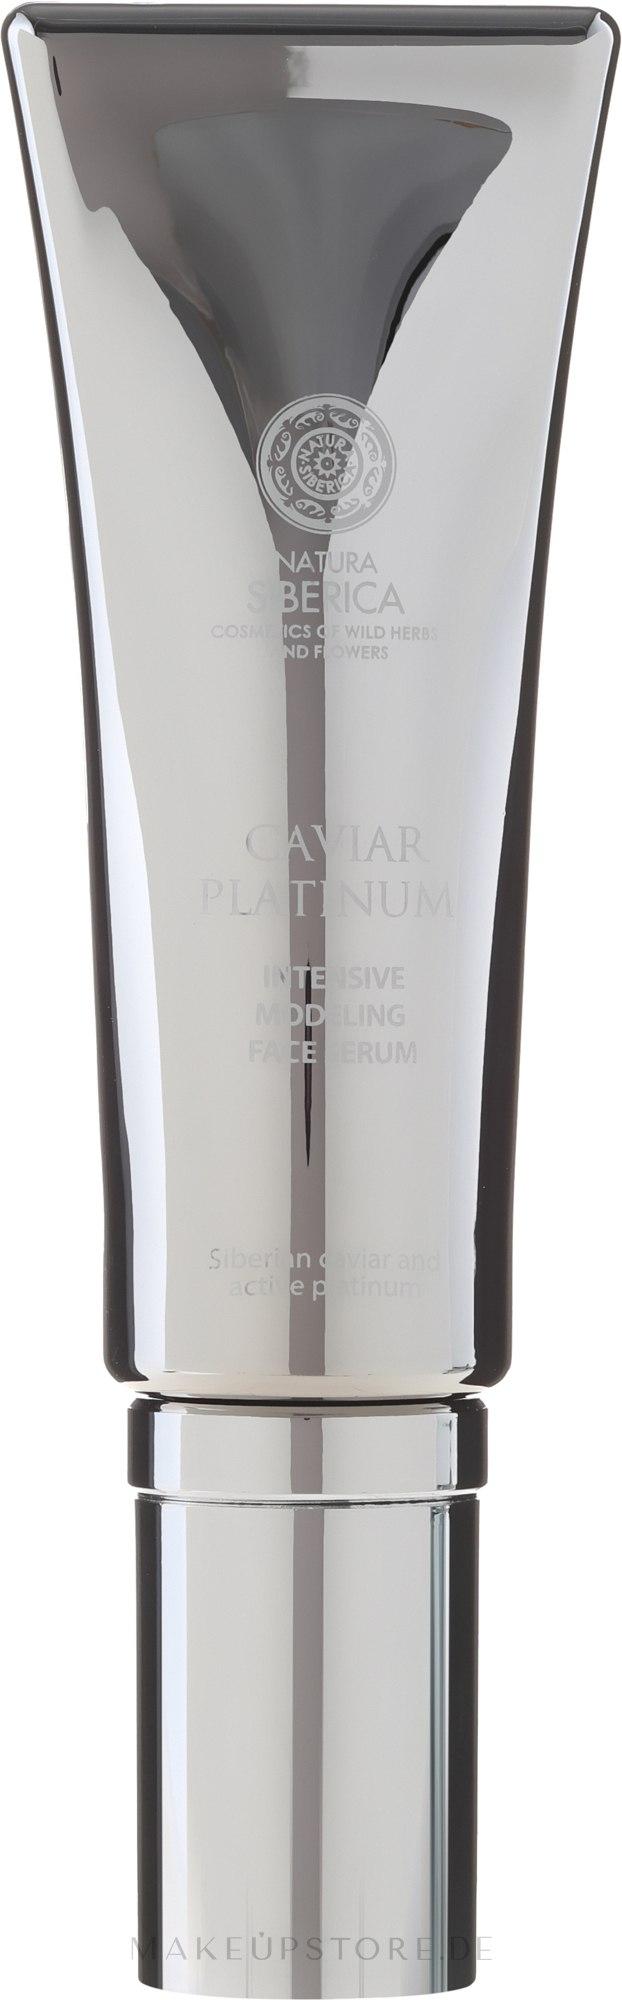 Intensives Modellierserum gegen tiefe Falten - Natura Siberica Caviar Platinum — Bild 30 ml